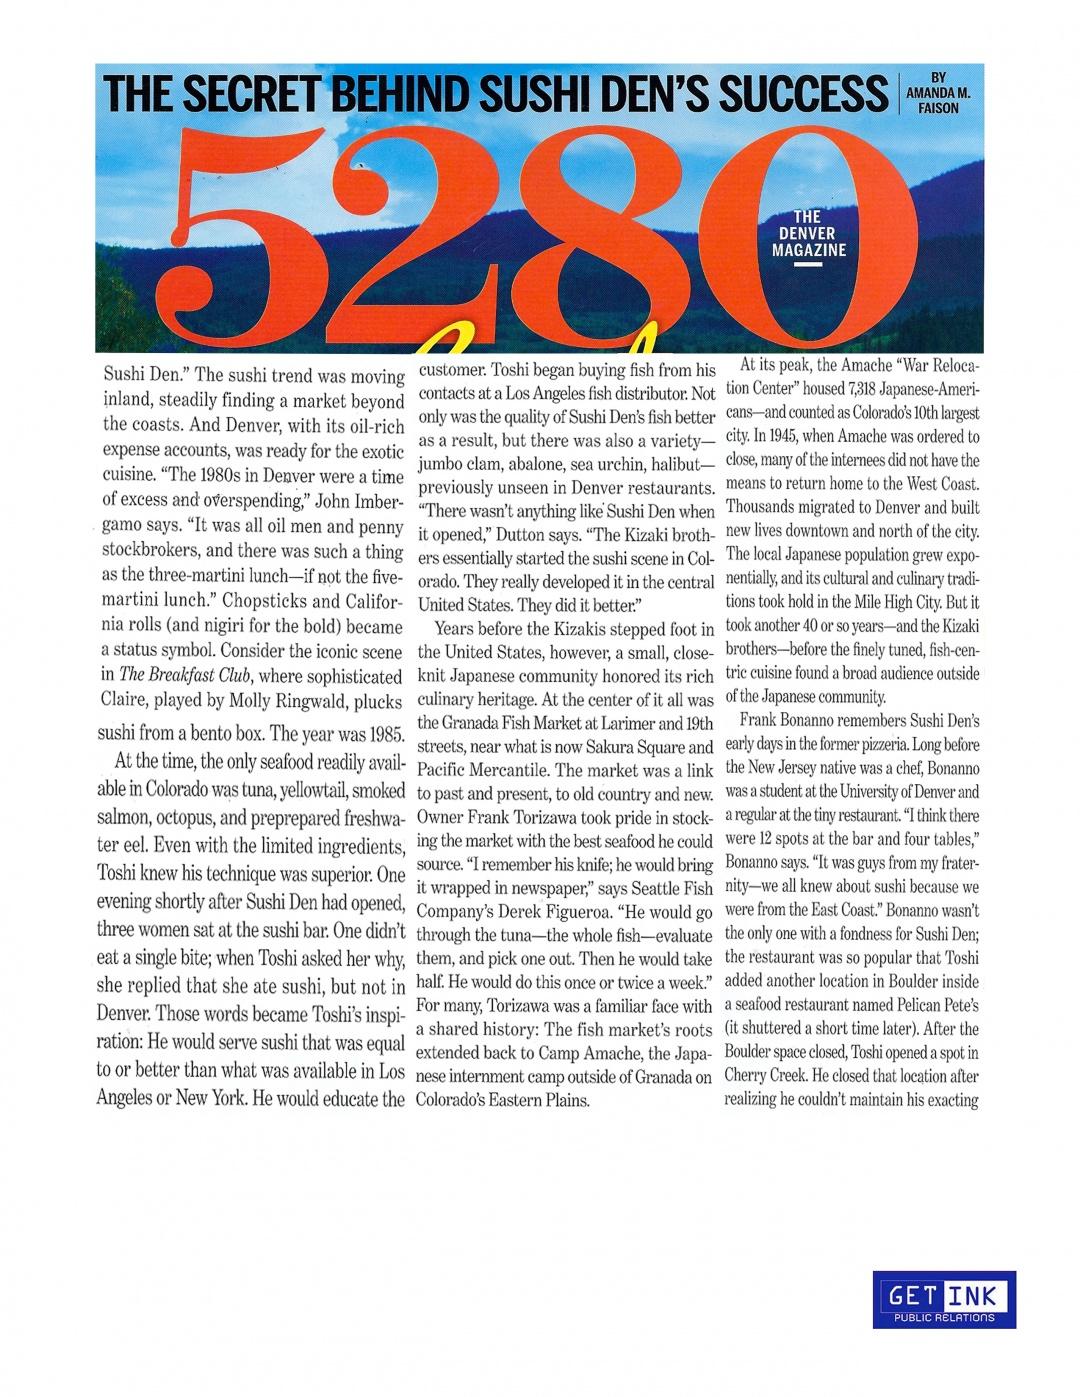 5280-Magazine-7-5.16.12